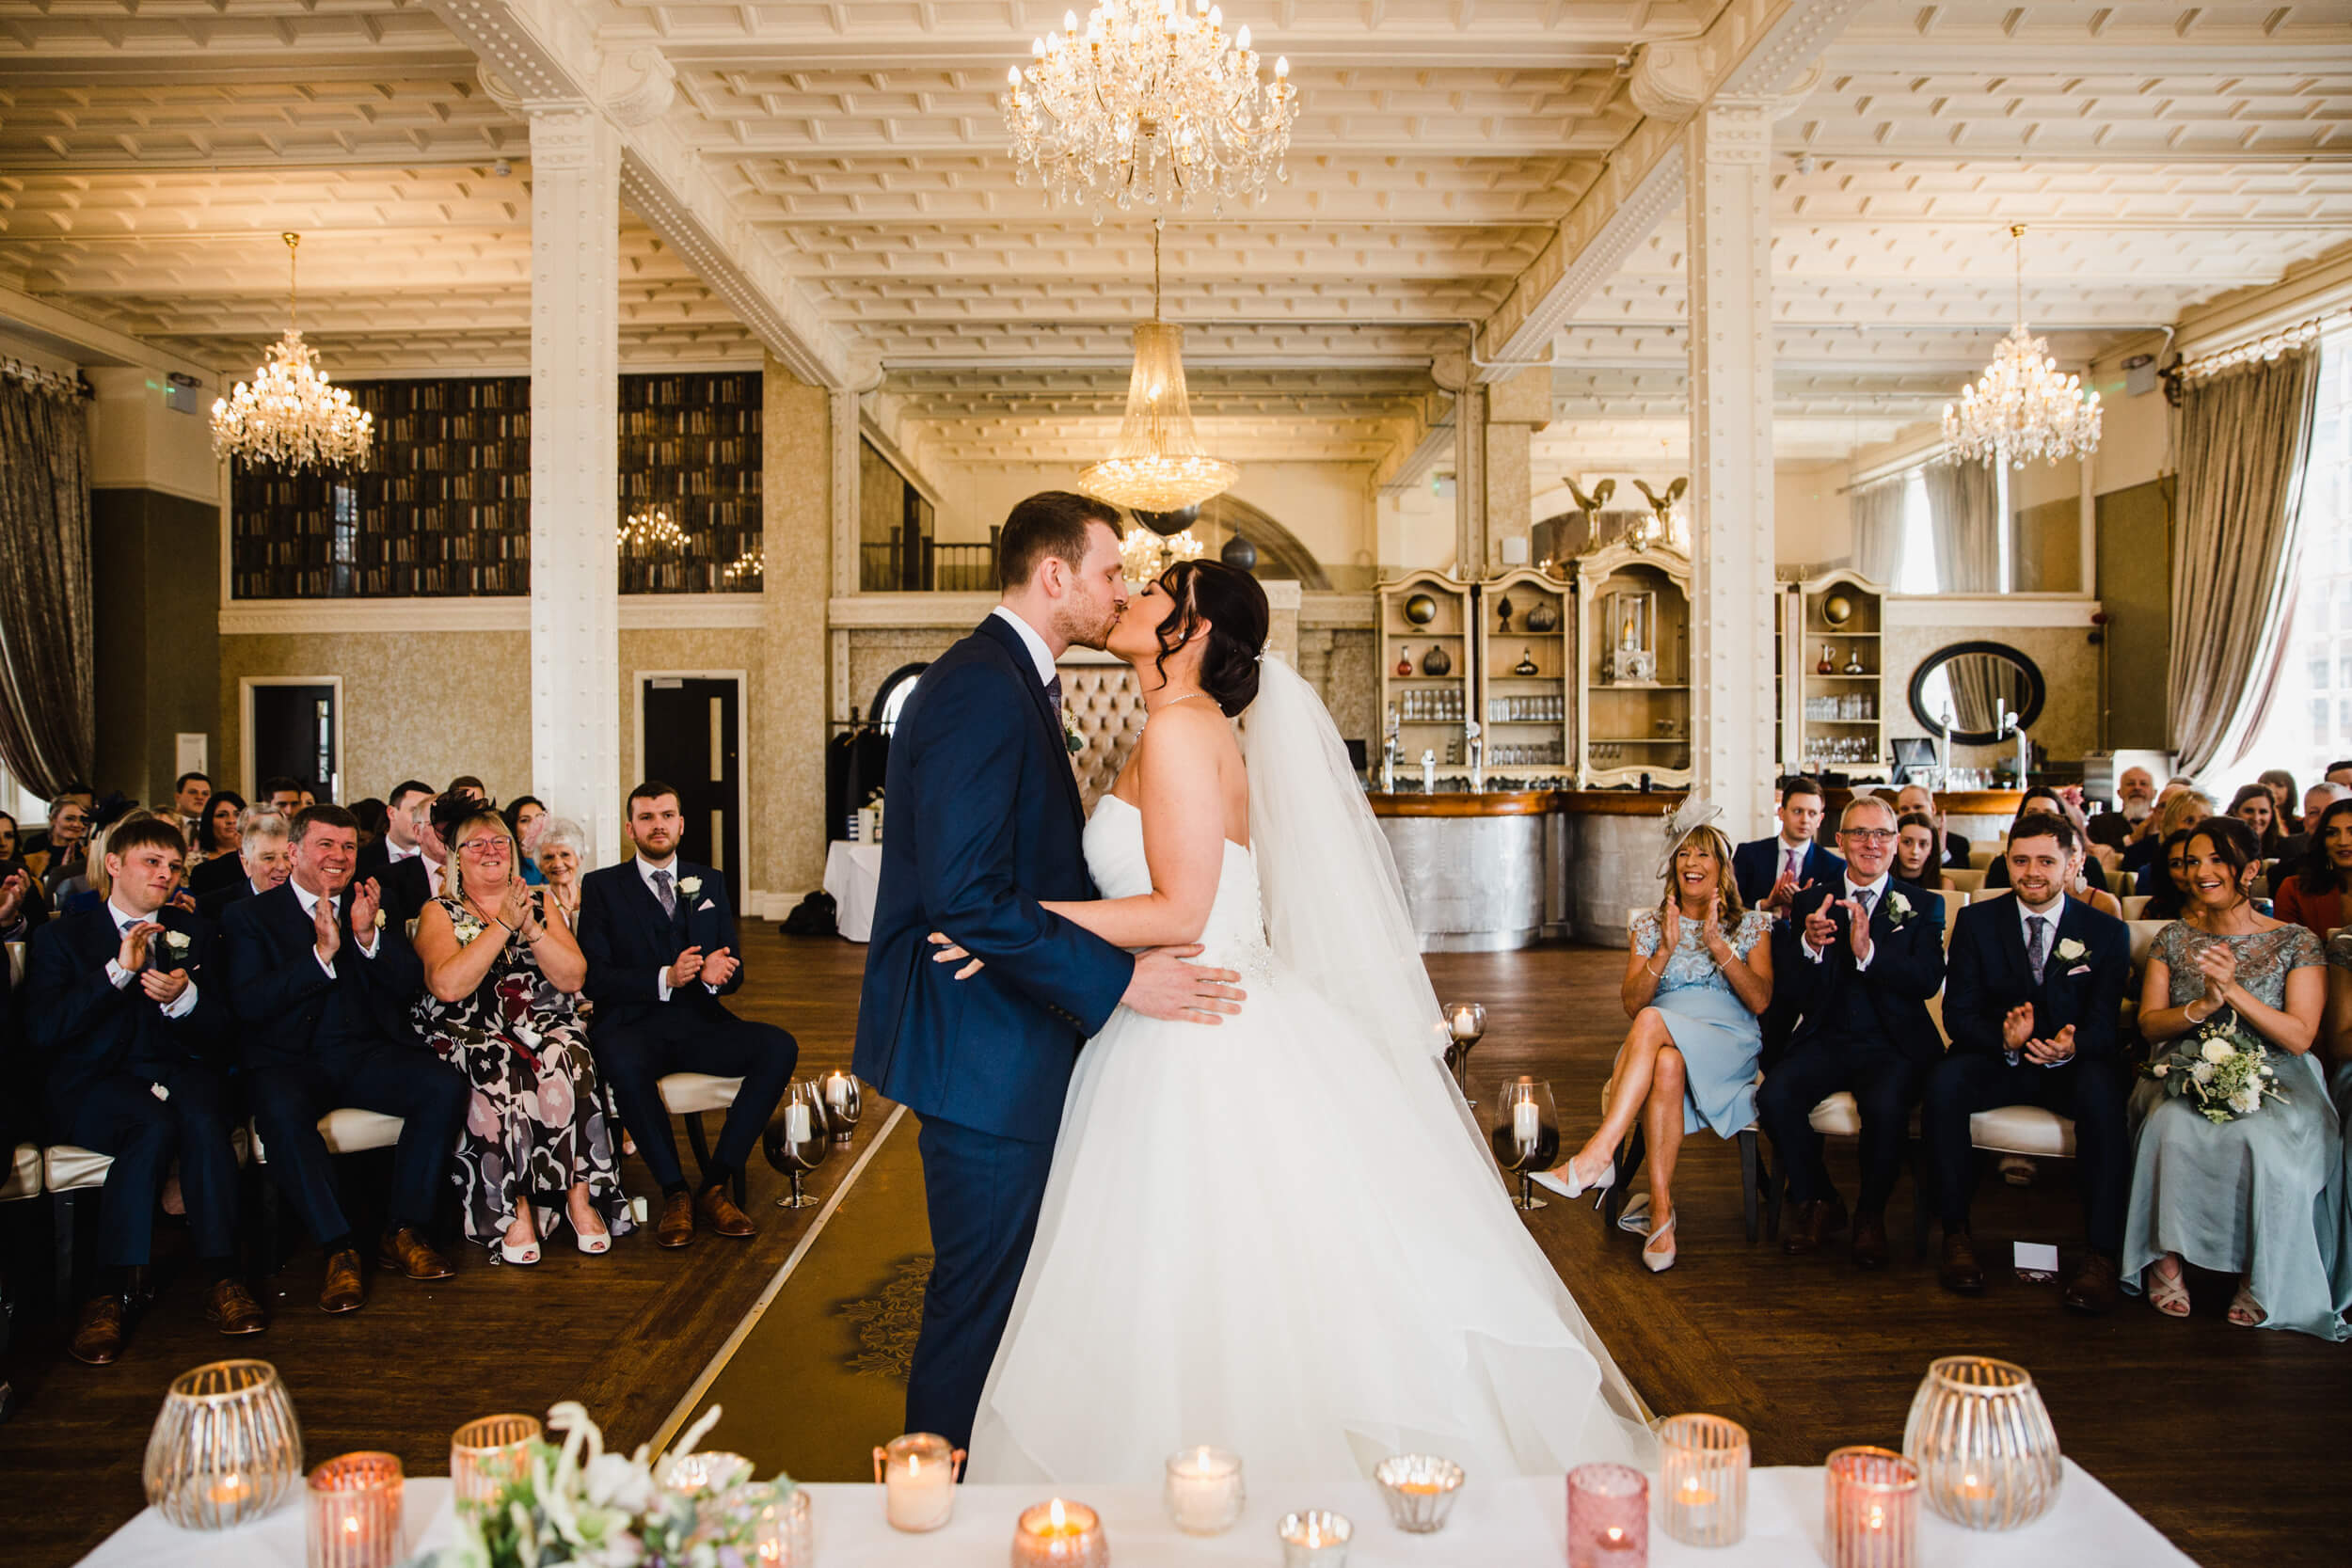 30_James_Street_Hotel_Wedding_Venue_023.jpg